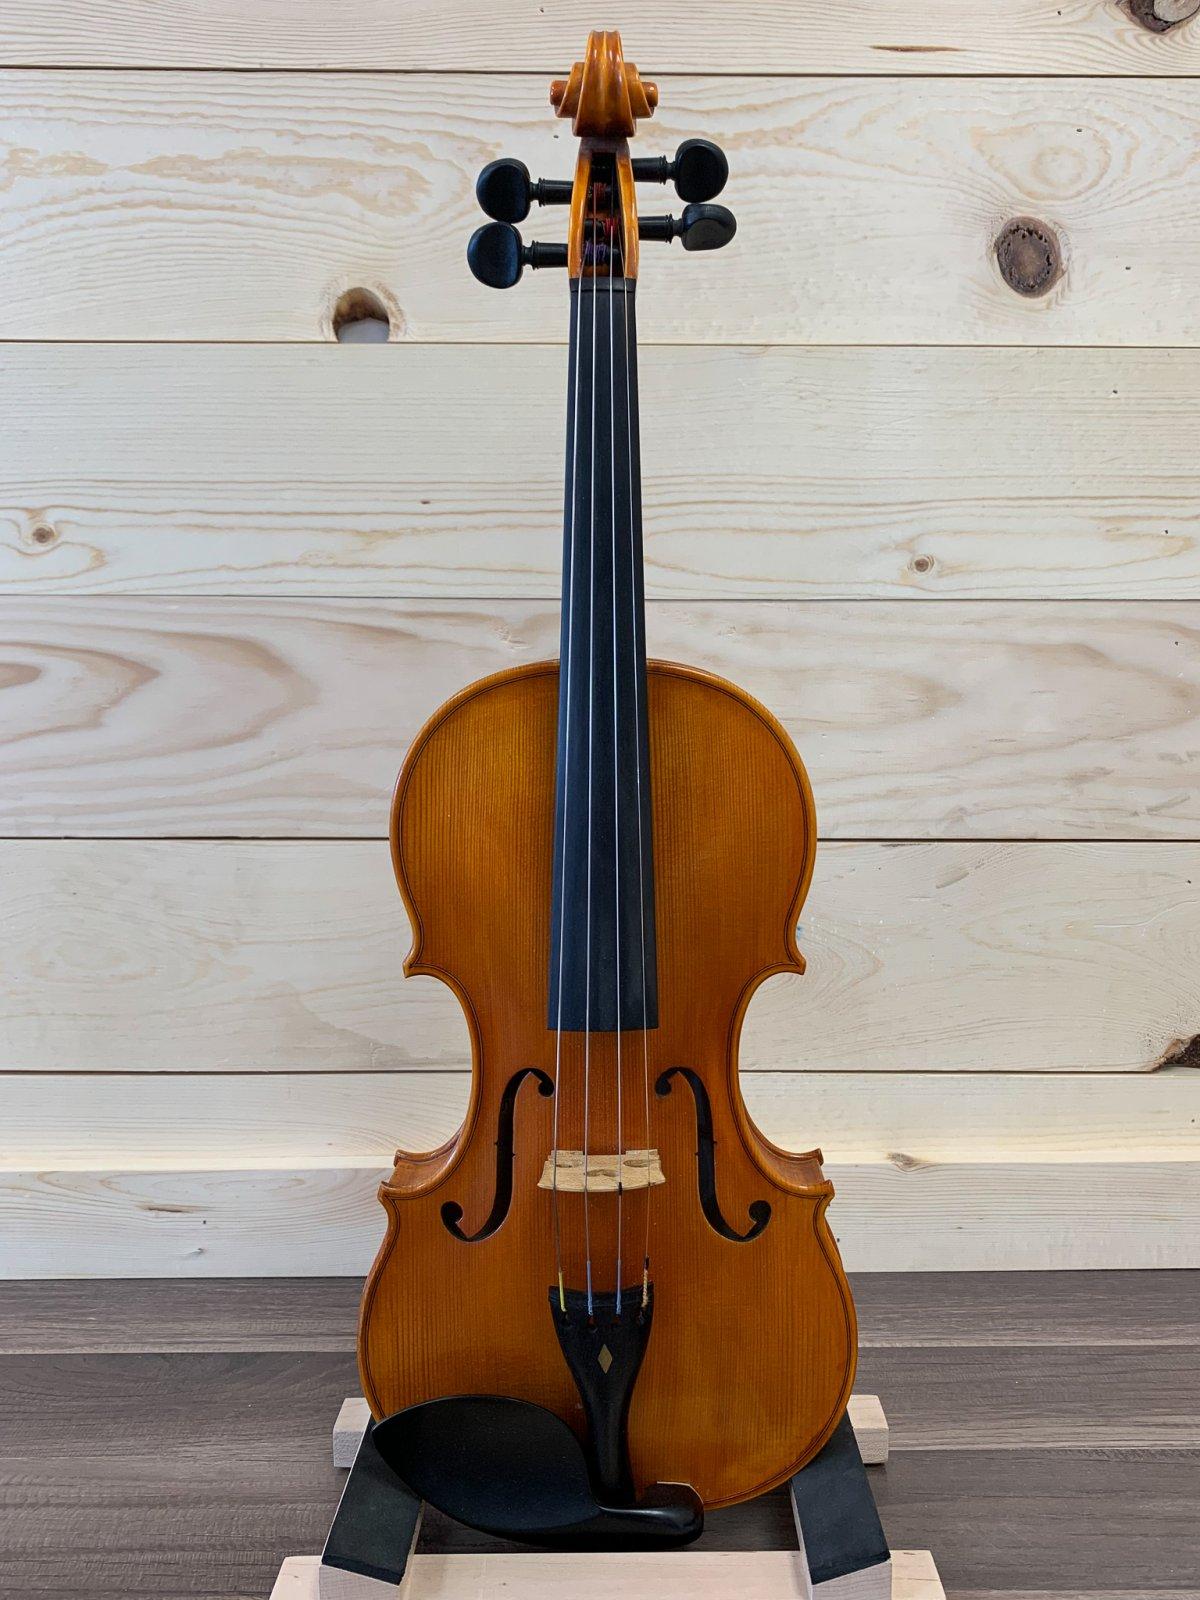 2008 Dvorak 4/4 Violin outfit